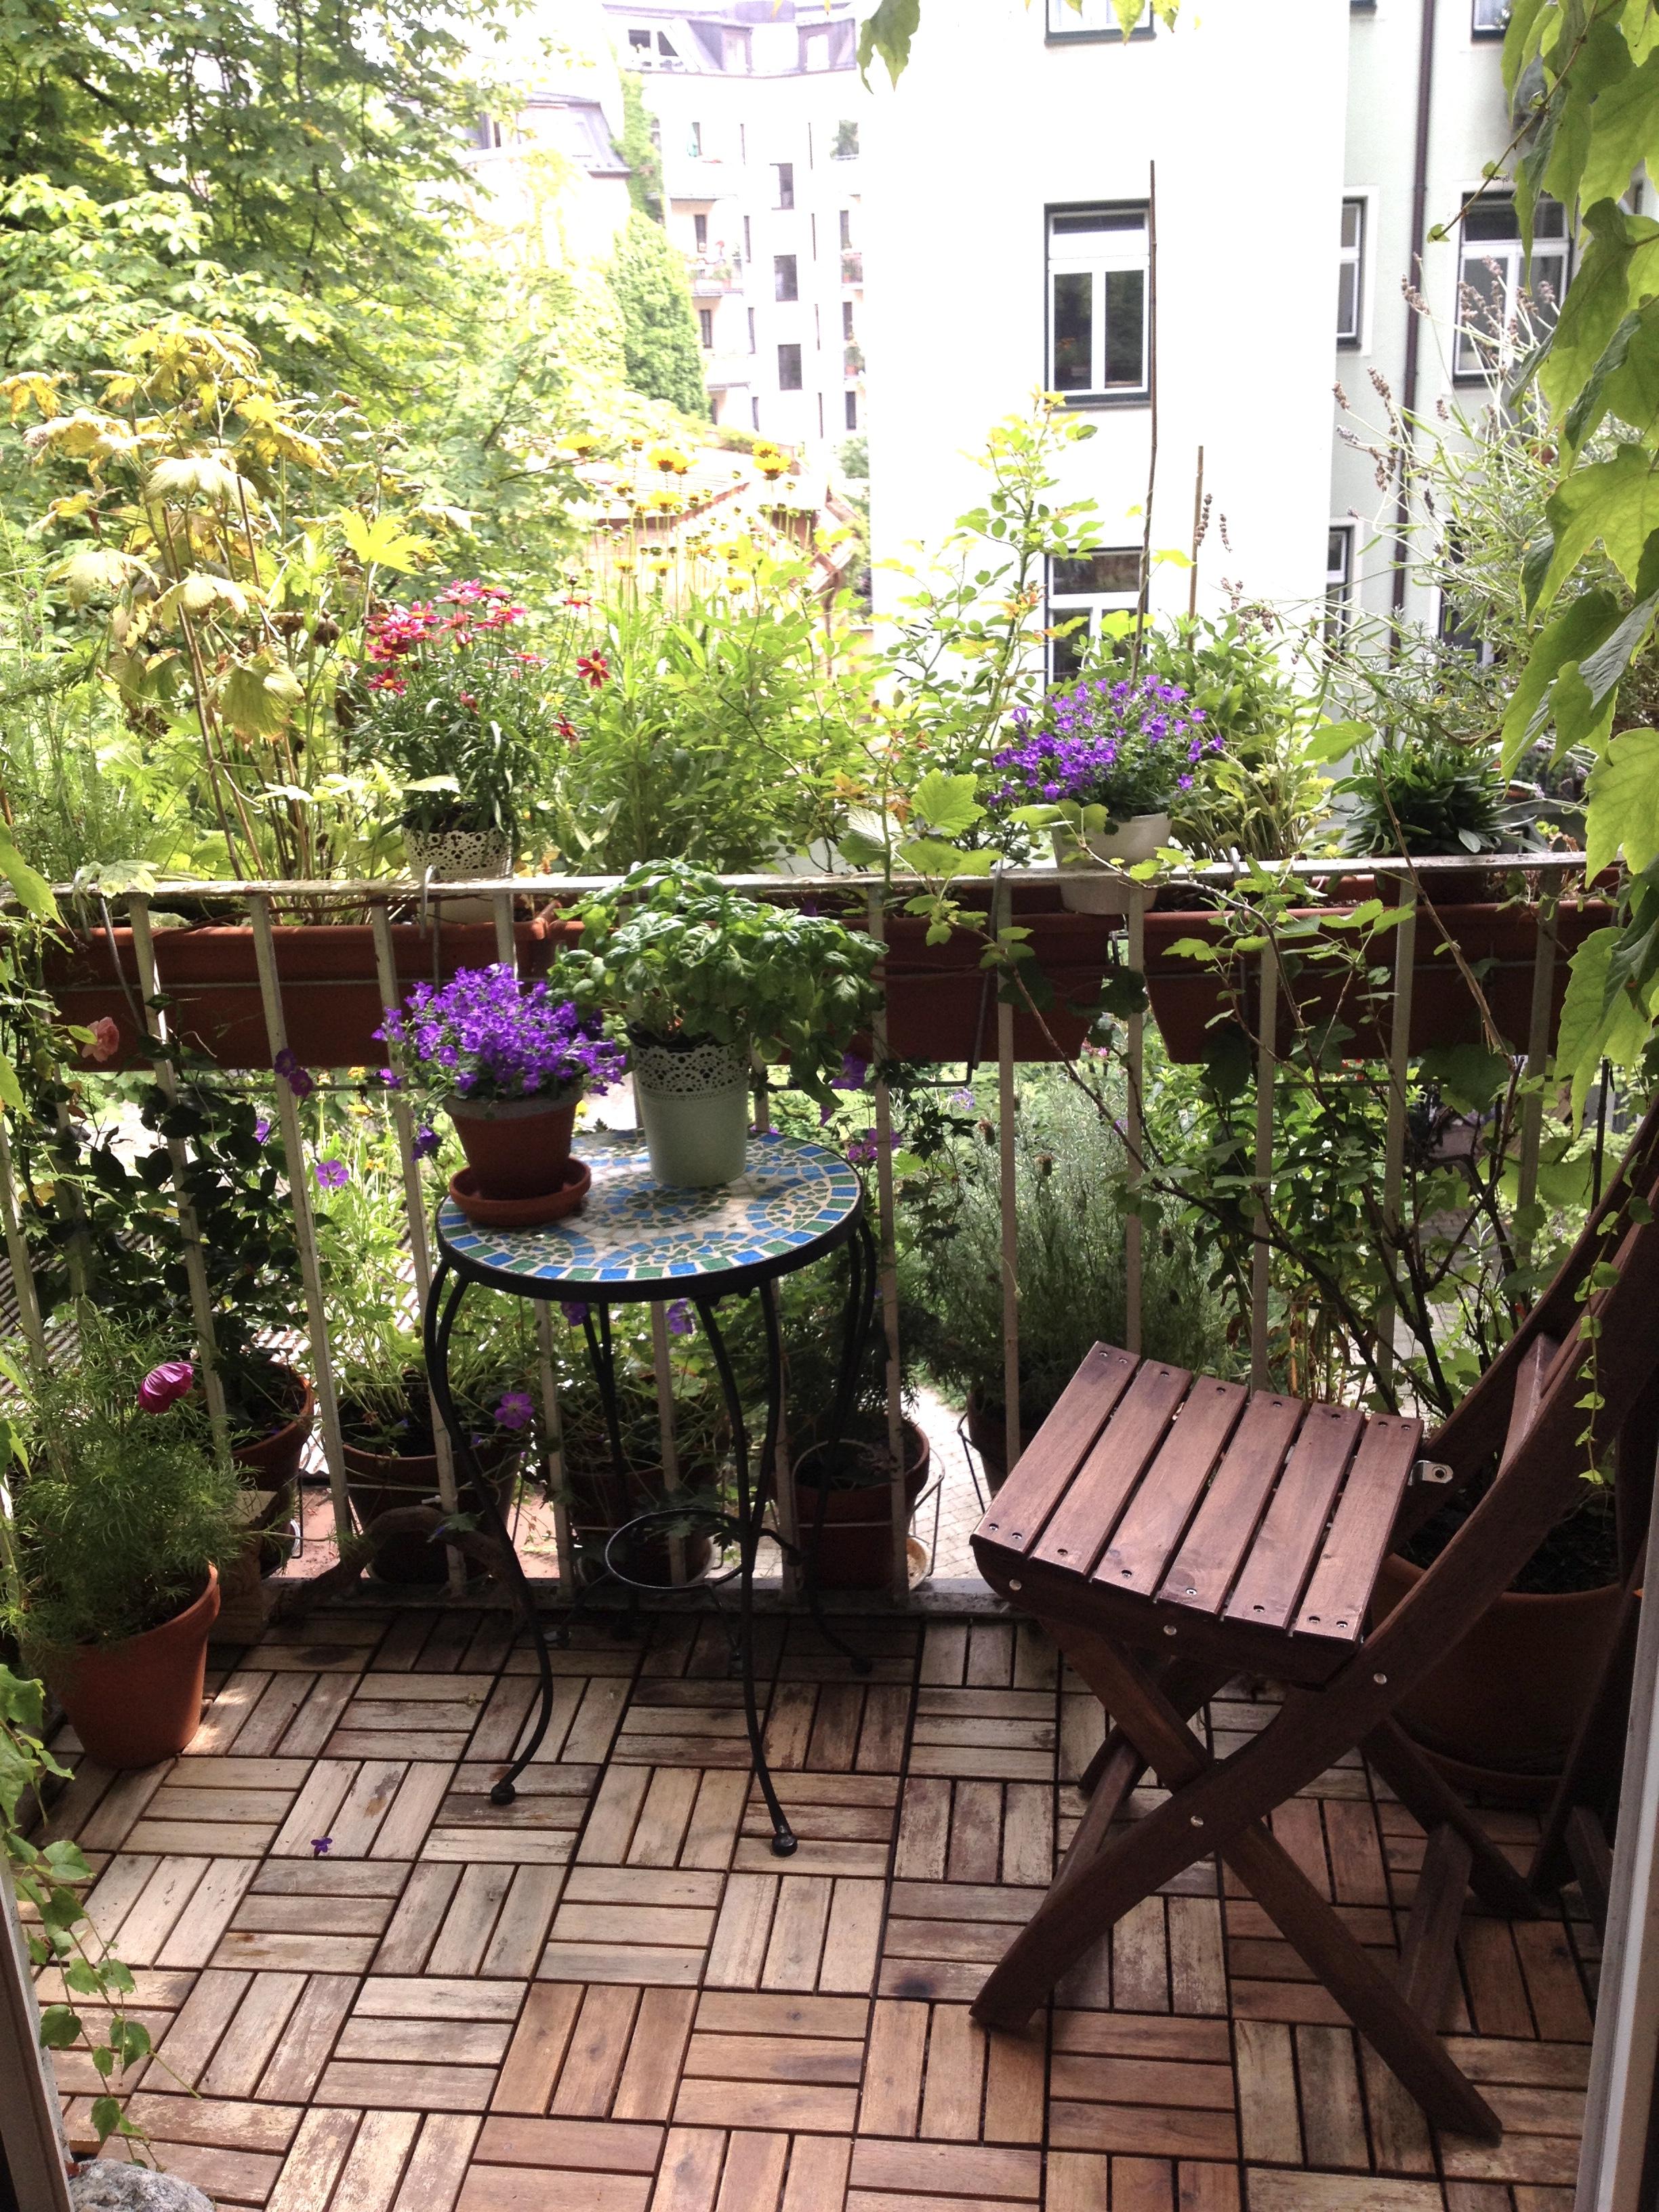 Wohnen, Pflanze, Naturholz, Garten, Natur, Tisch, Stuhl